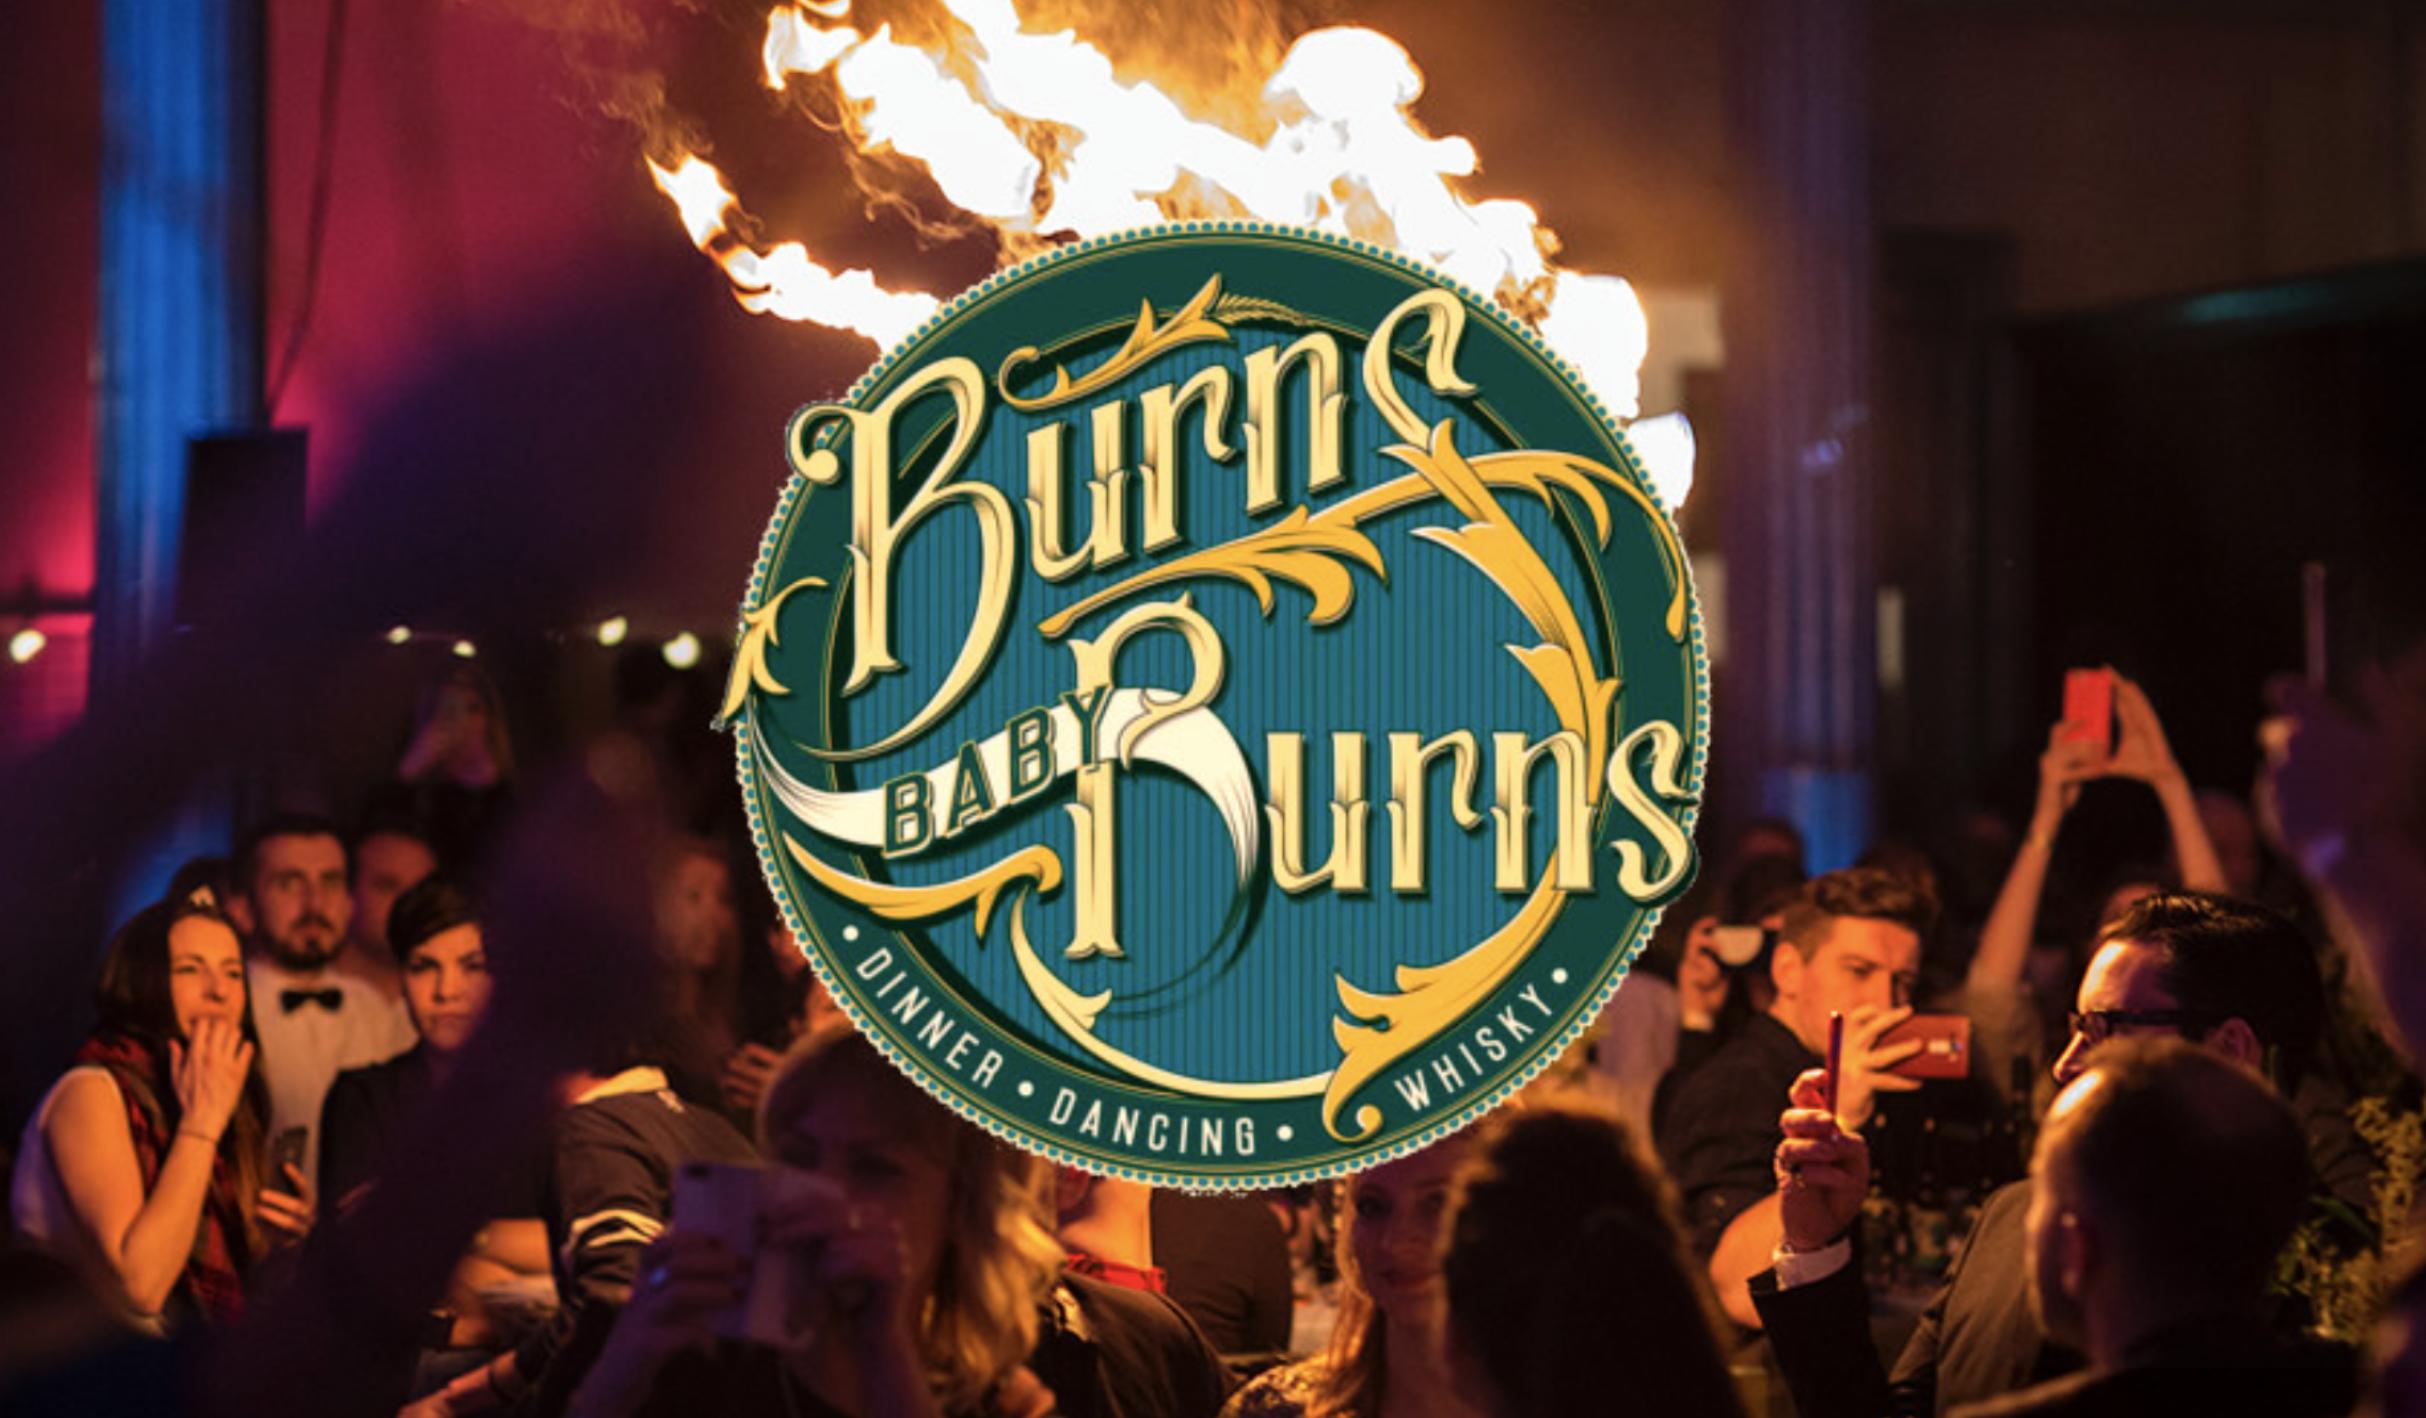 Burns Baby Burns - The Times - Burns nIGHT SUPPER